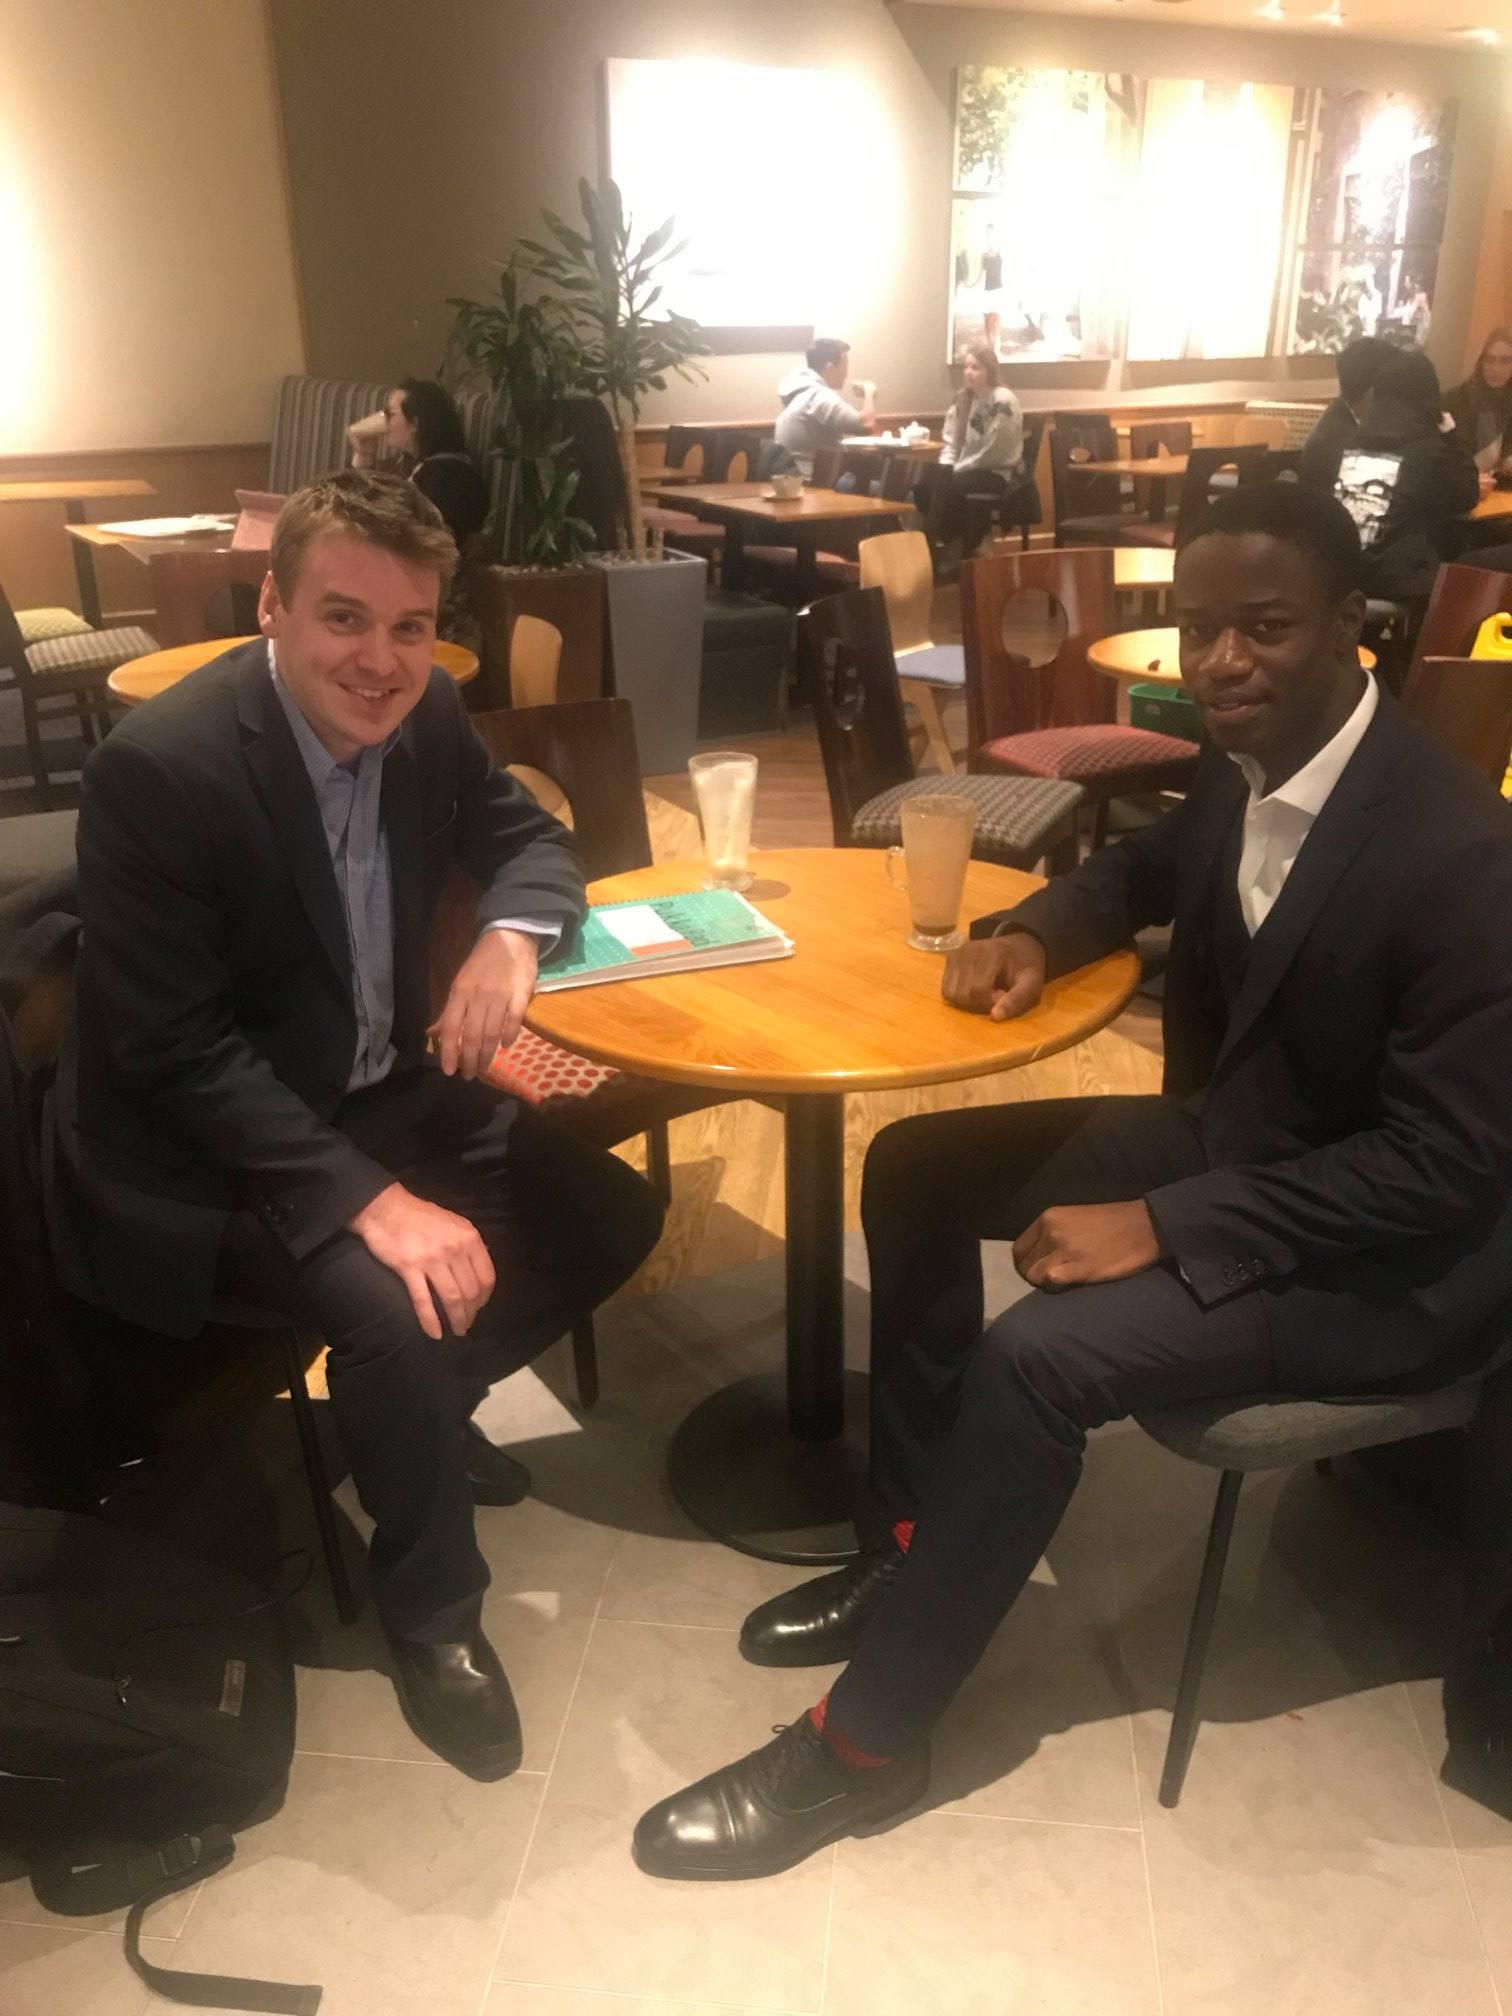 Meeting Isaac Codjoe – Ipswich Youth MP